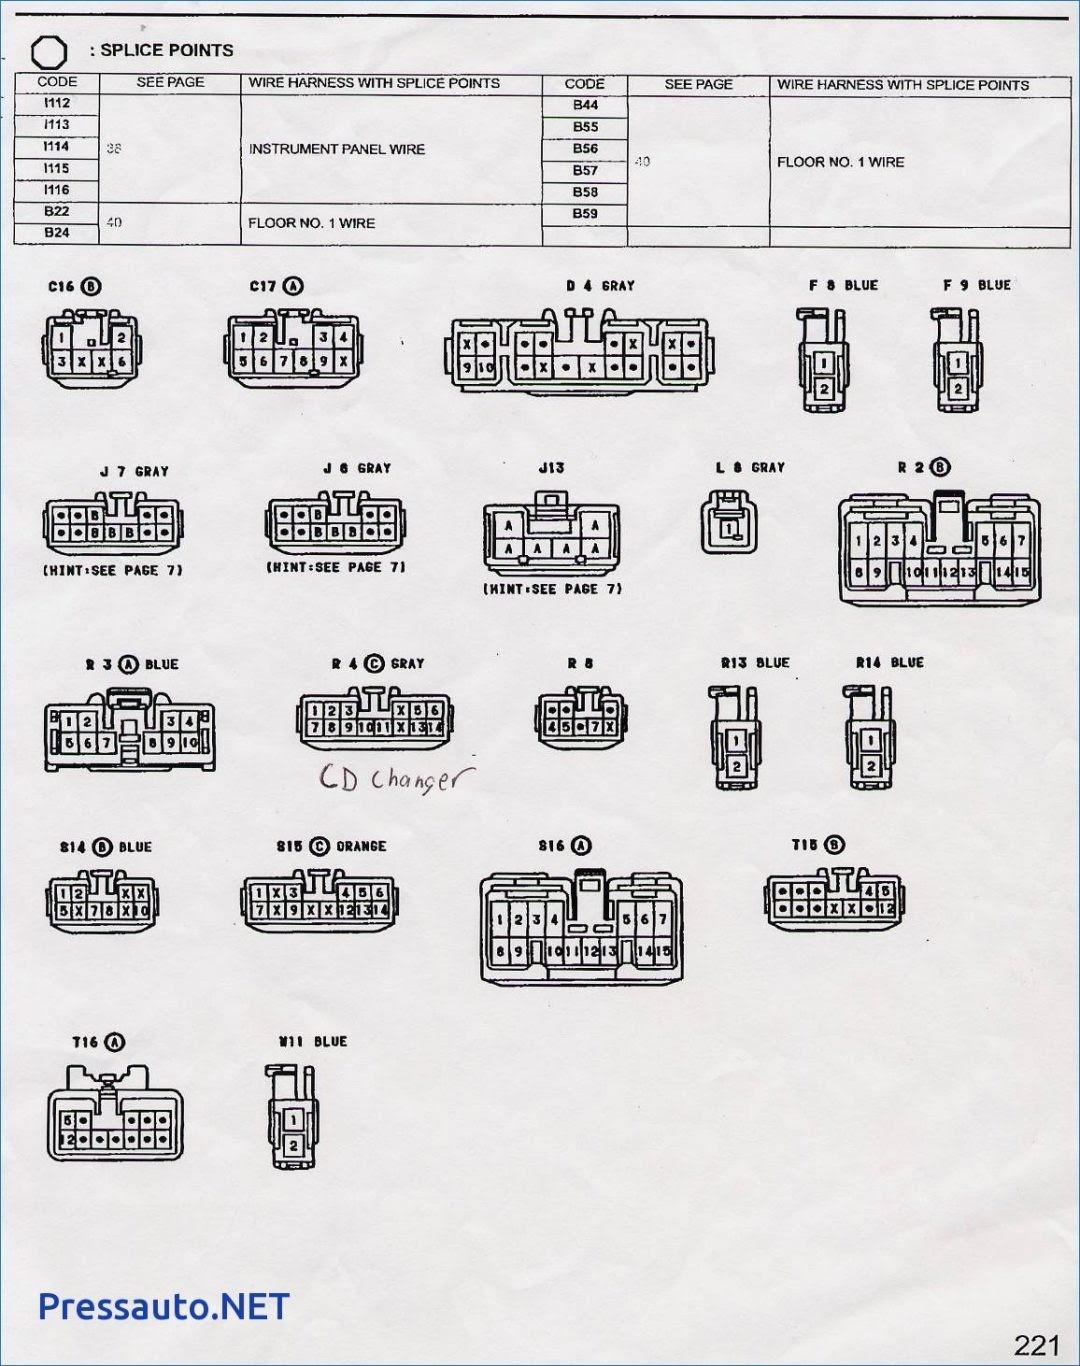 Diagram Radio Wiring Diagram For 2002 Sienna Full Version Hd Quality 2002 Sienna Lottodiagram1 Unrp Infos Fr